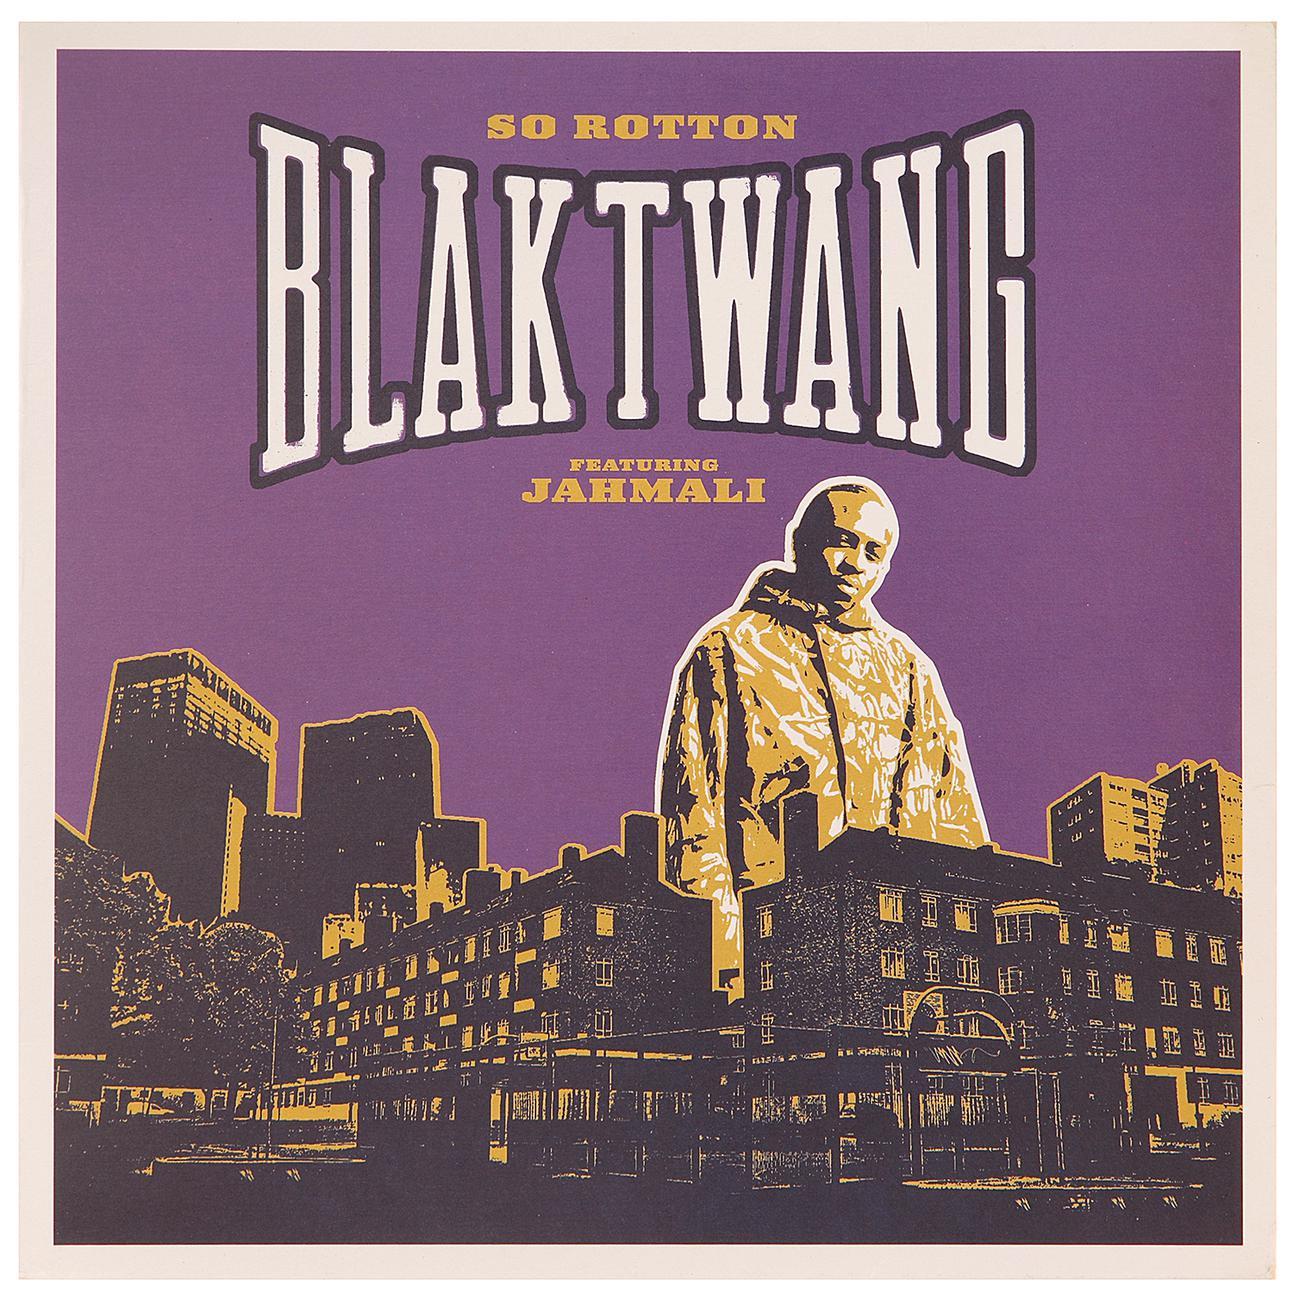 Banksy-Blaktwang (So Rotton)-2002